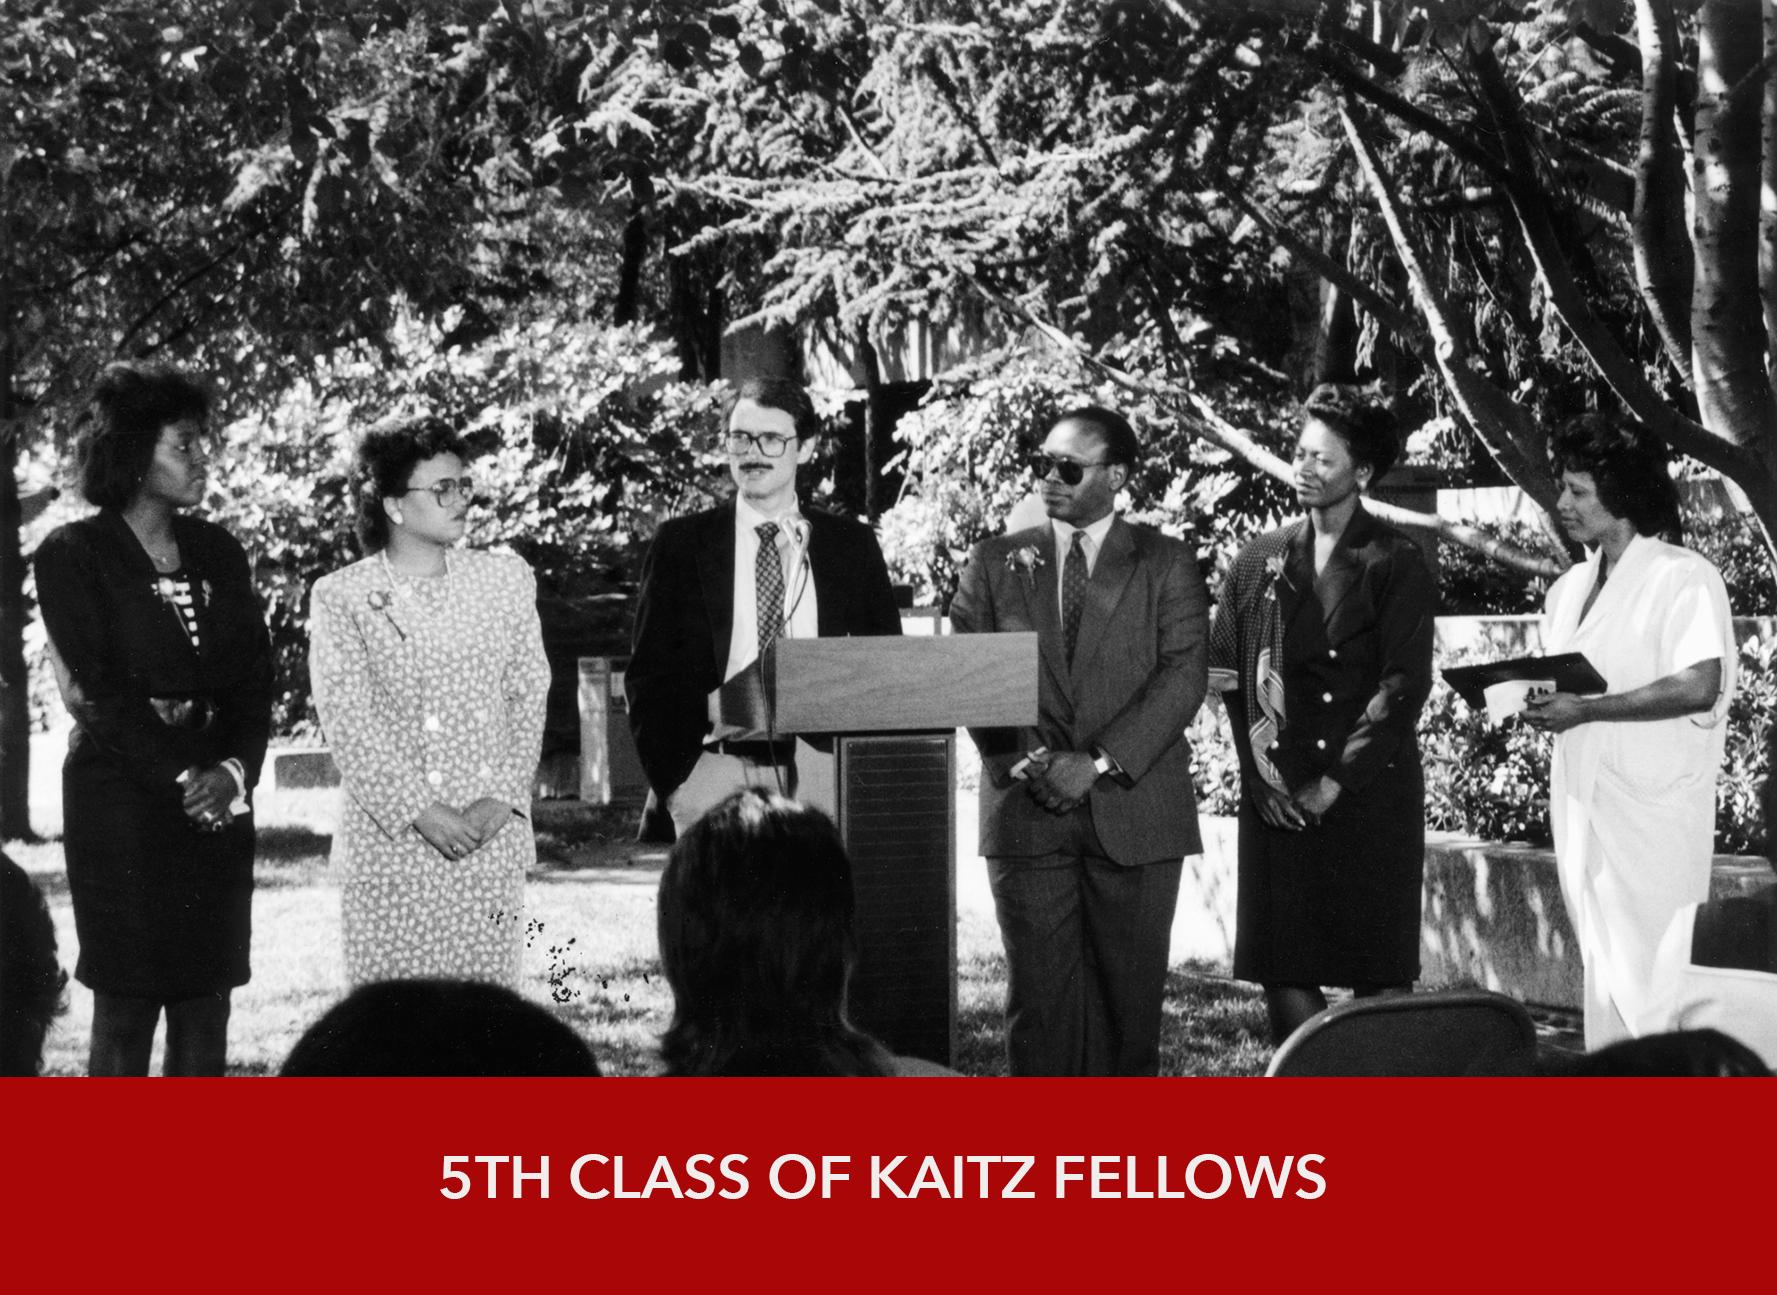 5th Class of Kaitz Fellows